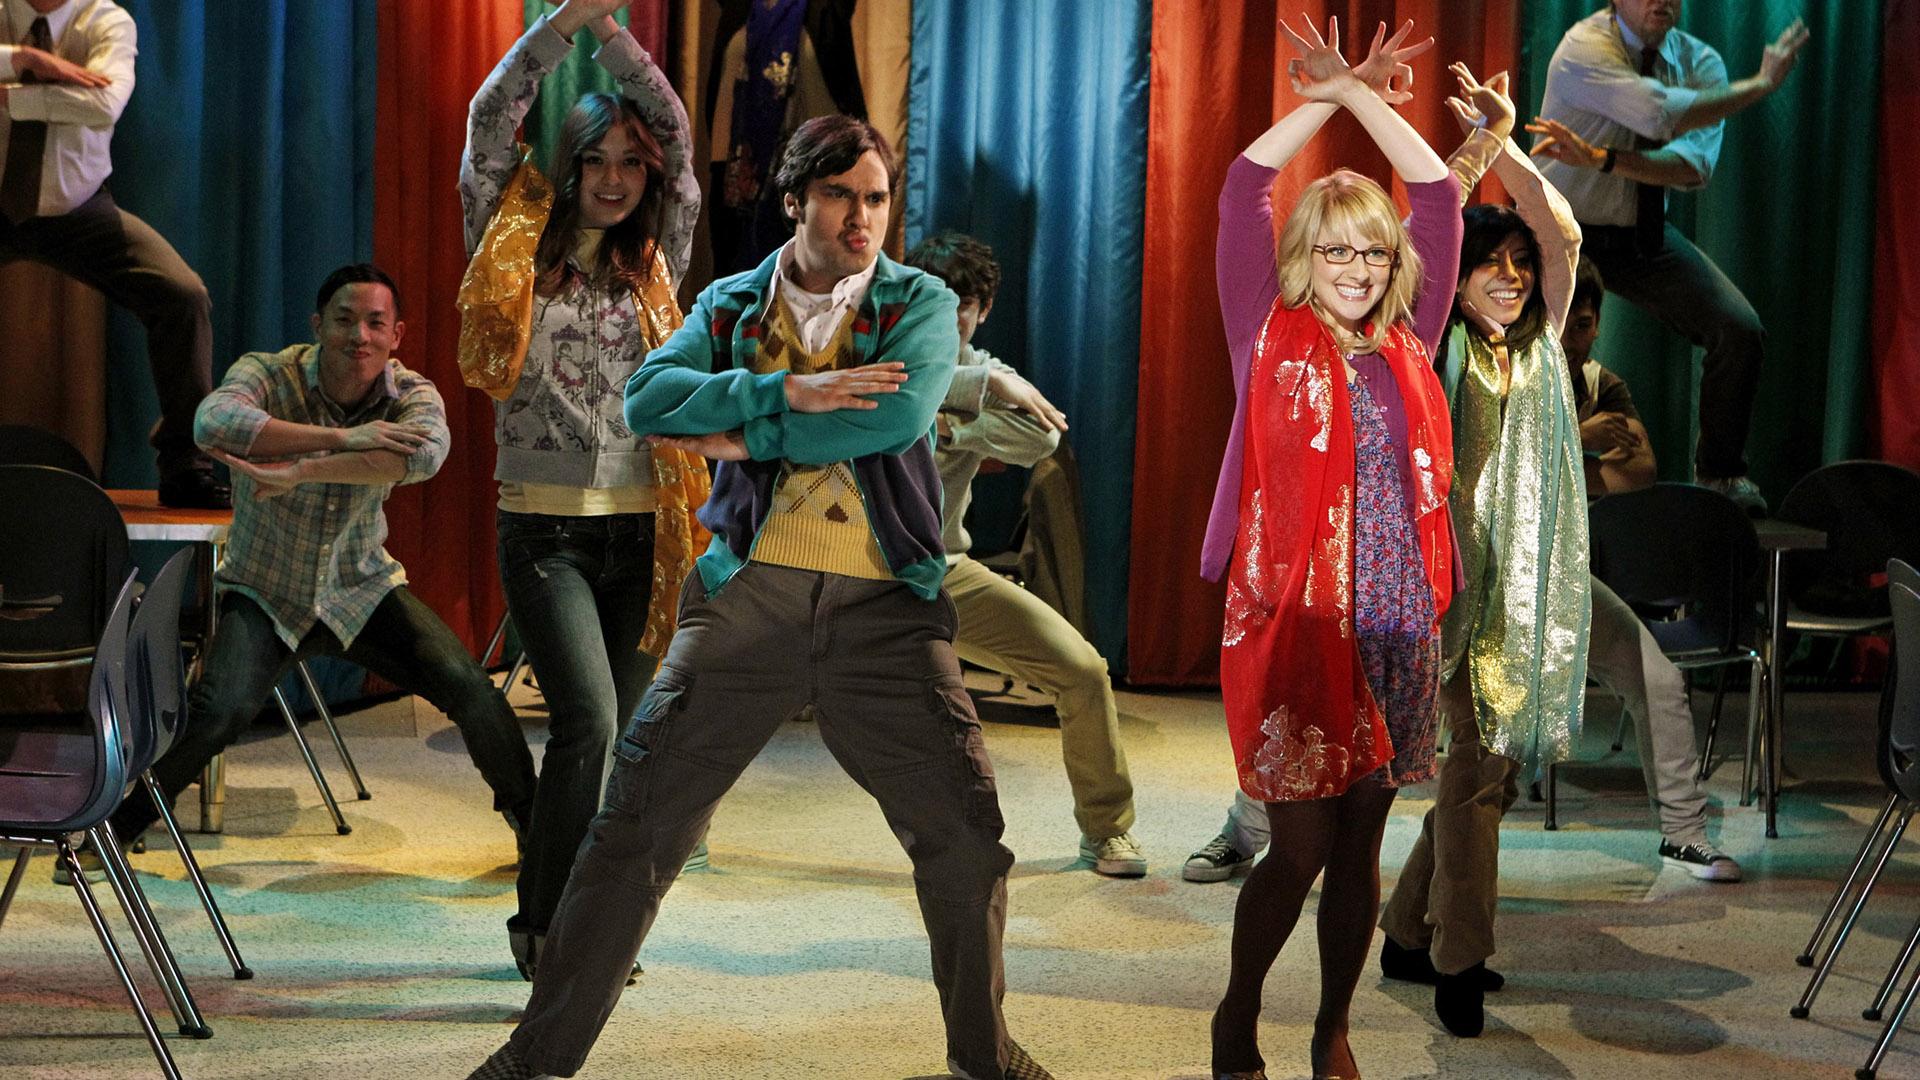 Dance like there's no tomorrow.